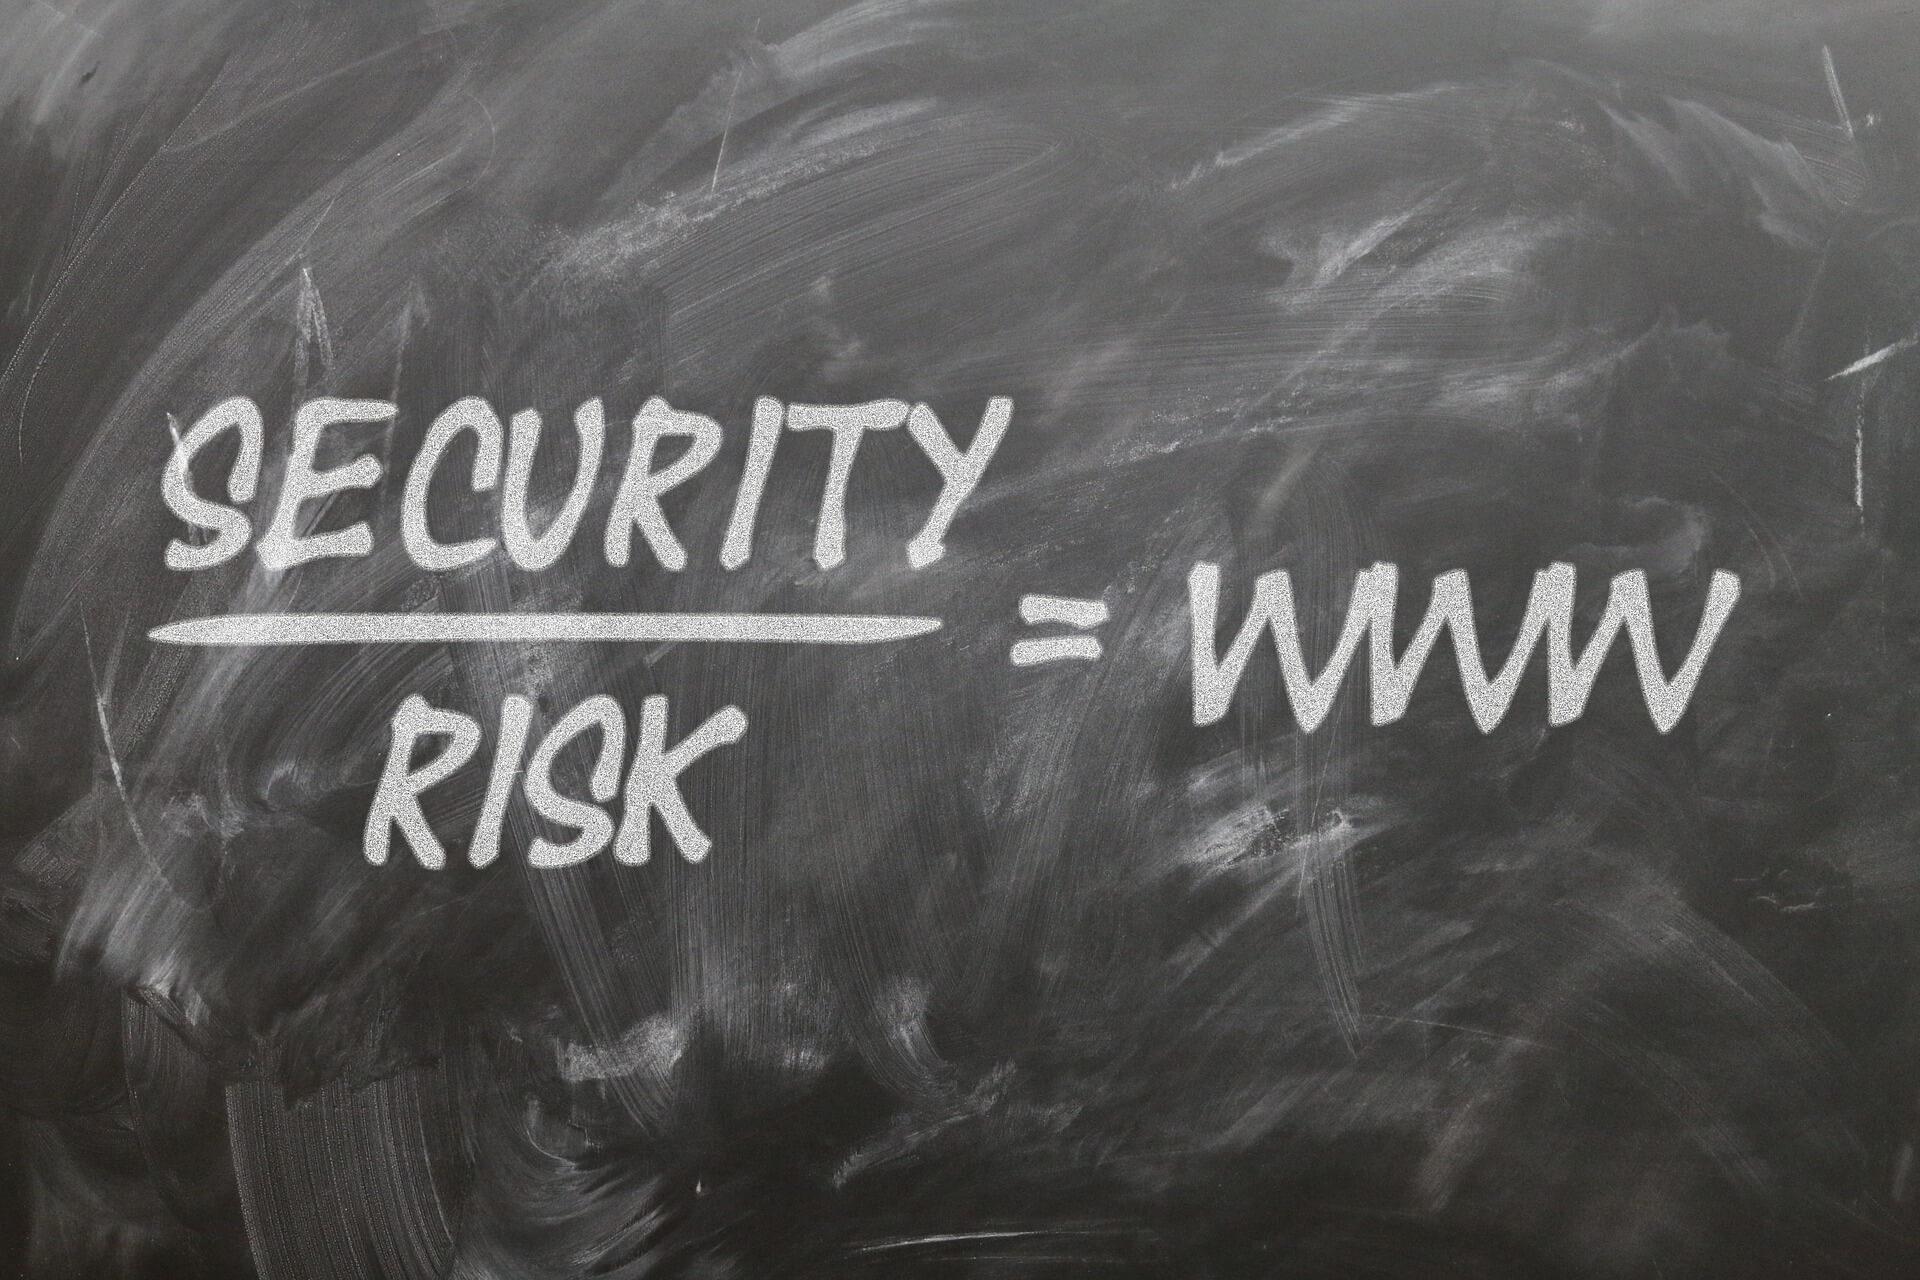 Data protection course details